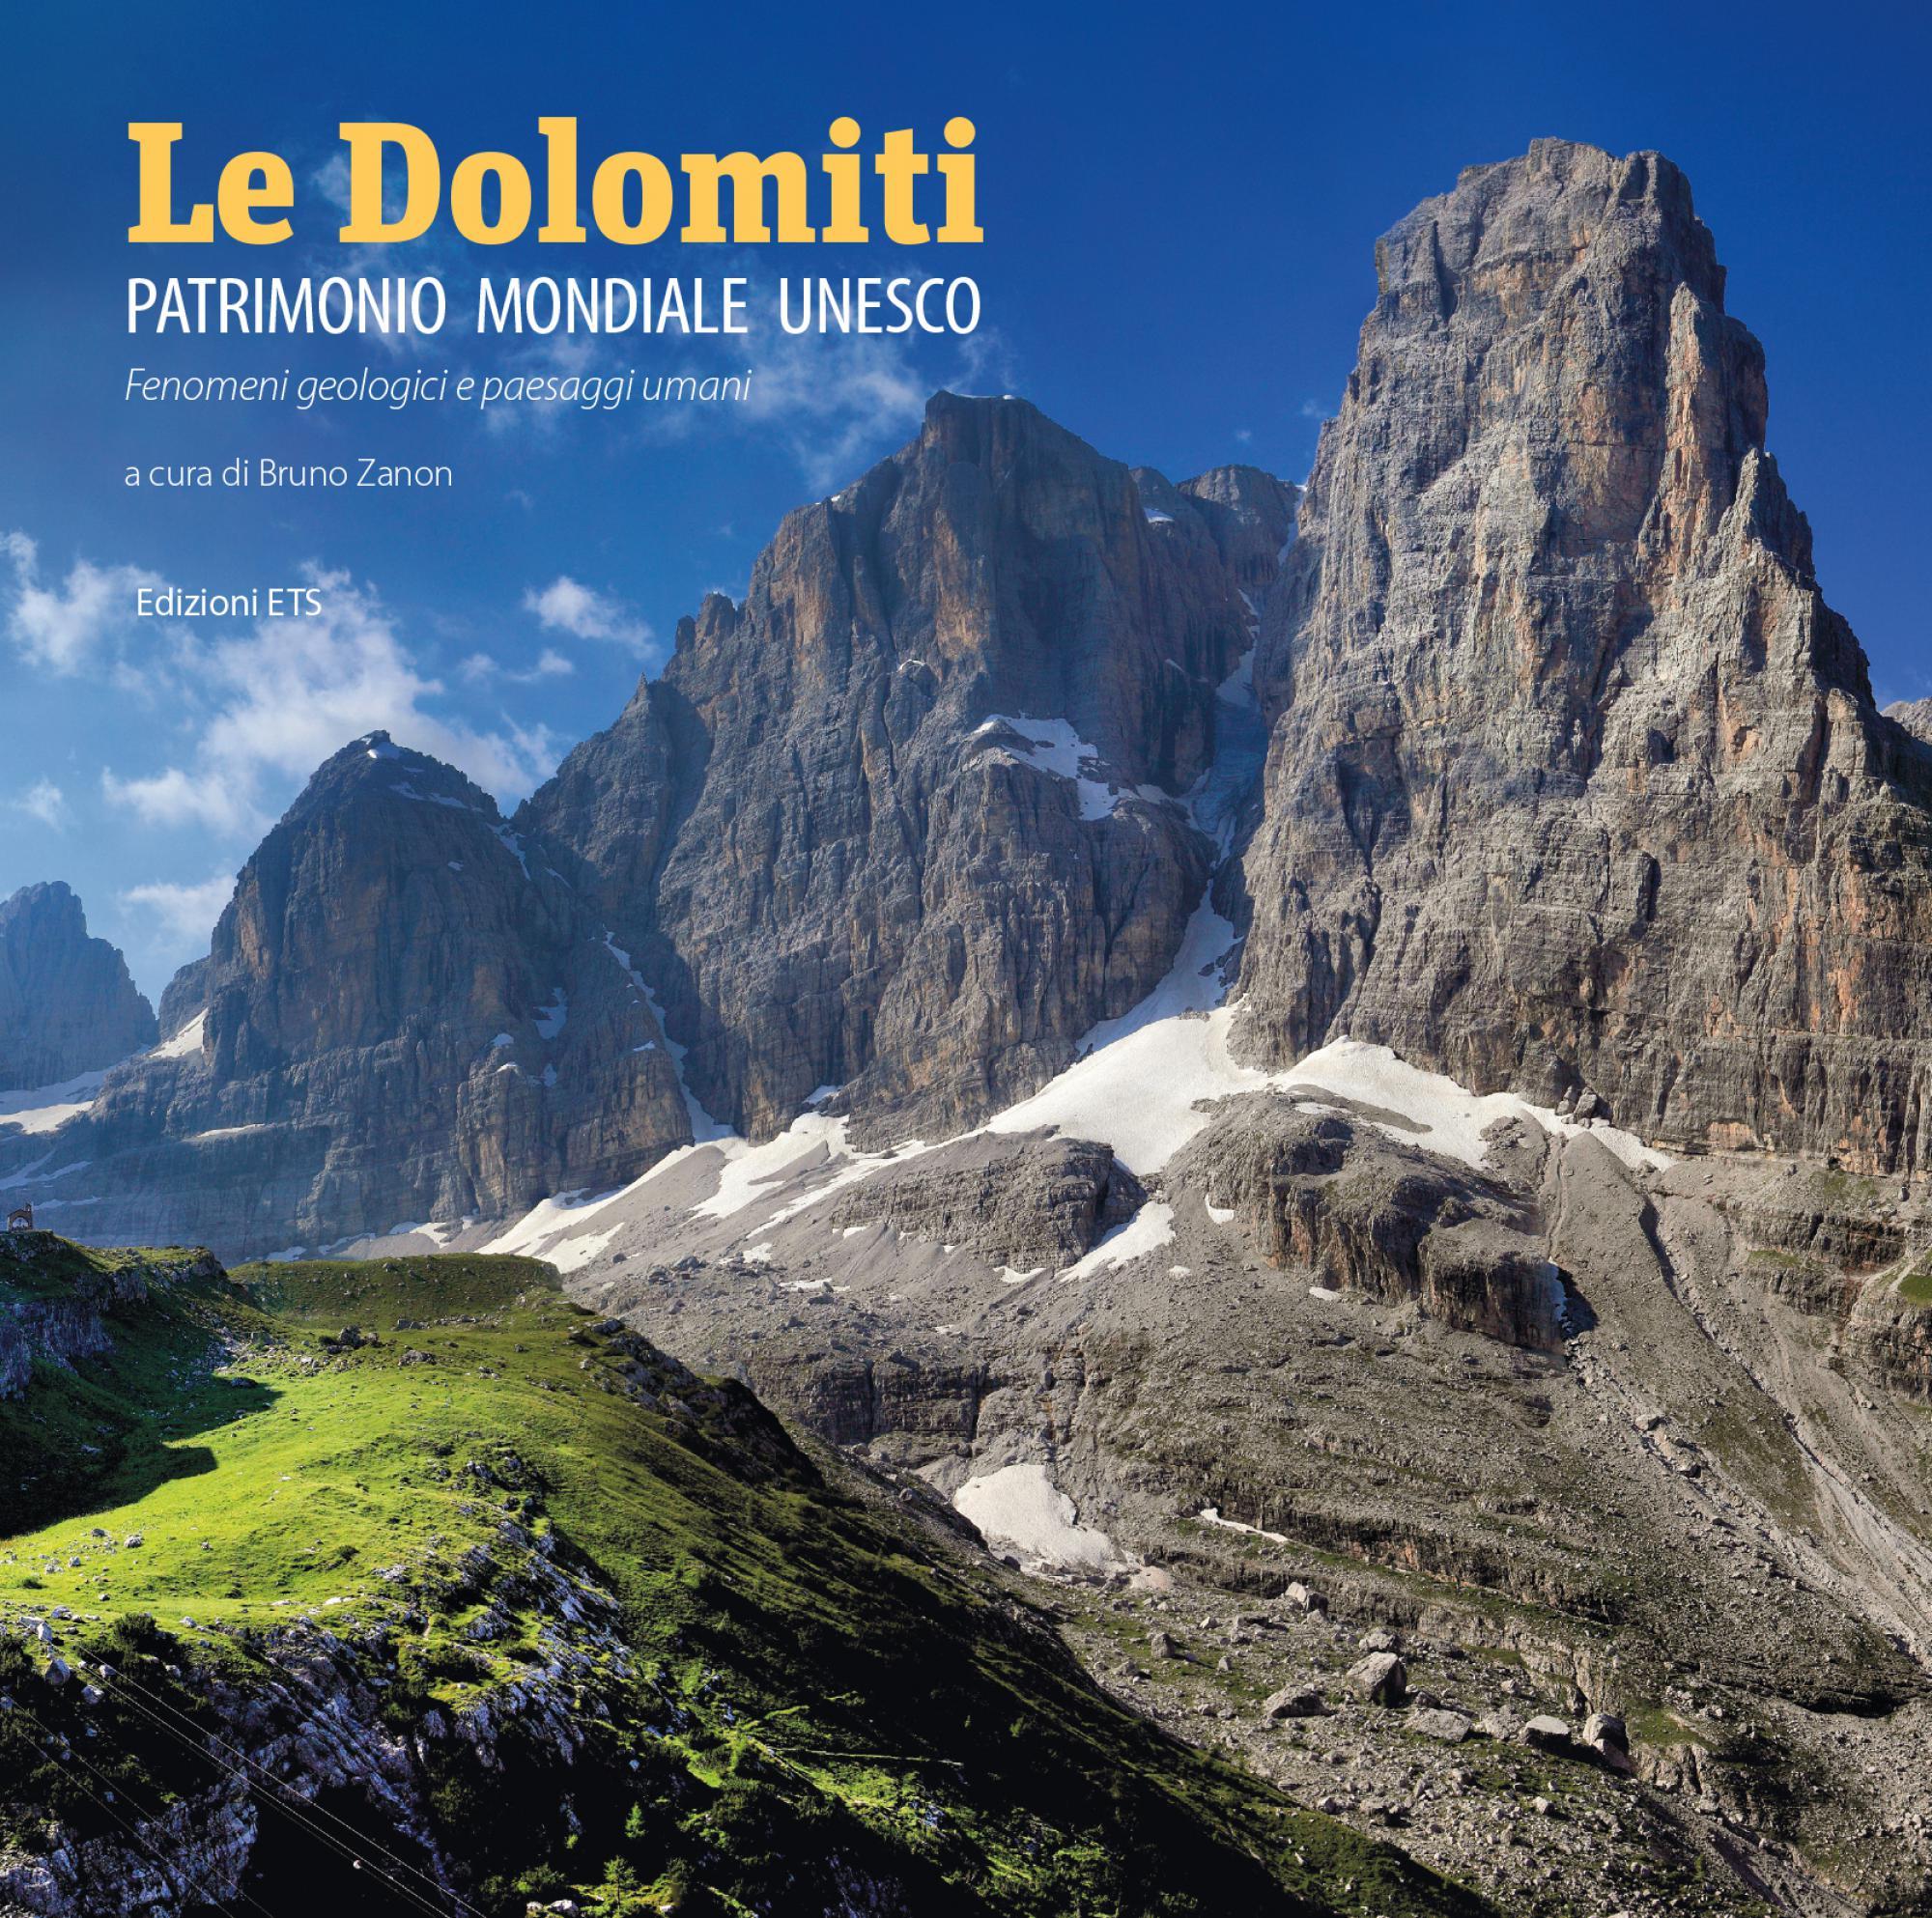 Le Dolomiti.Patrimonio mondiale Unesco. Fenomeni geologici e paesaggi umani